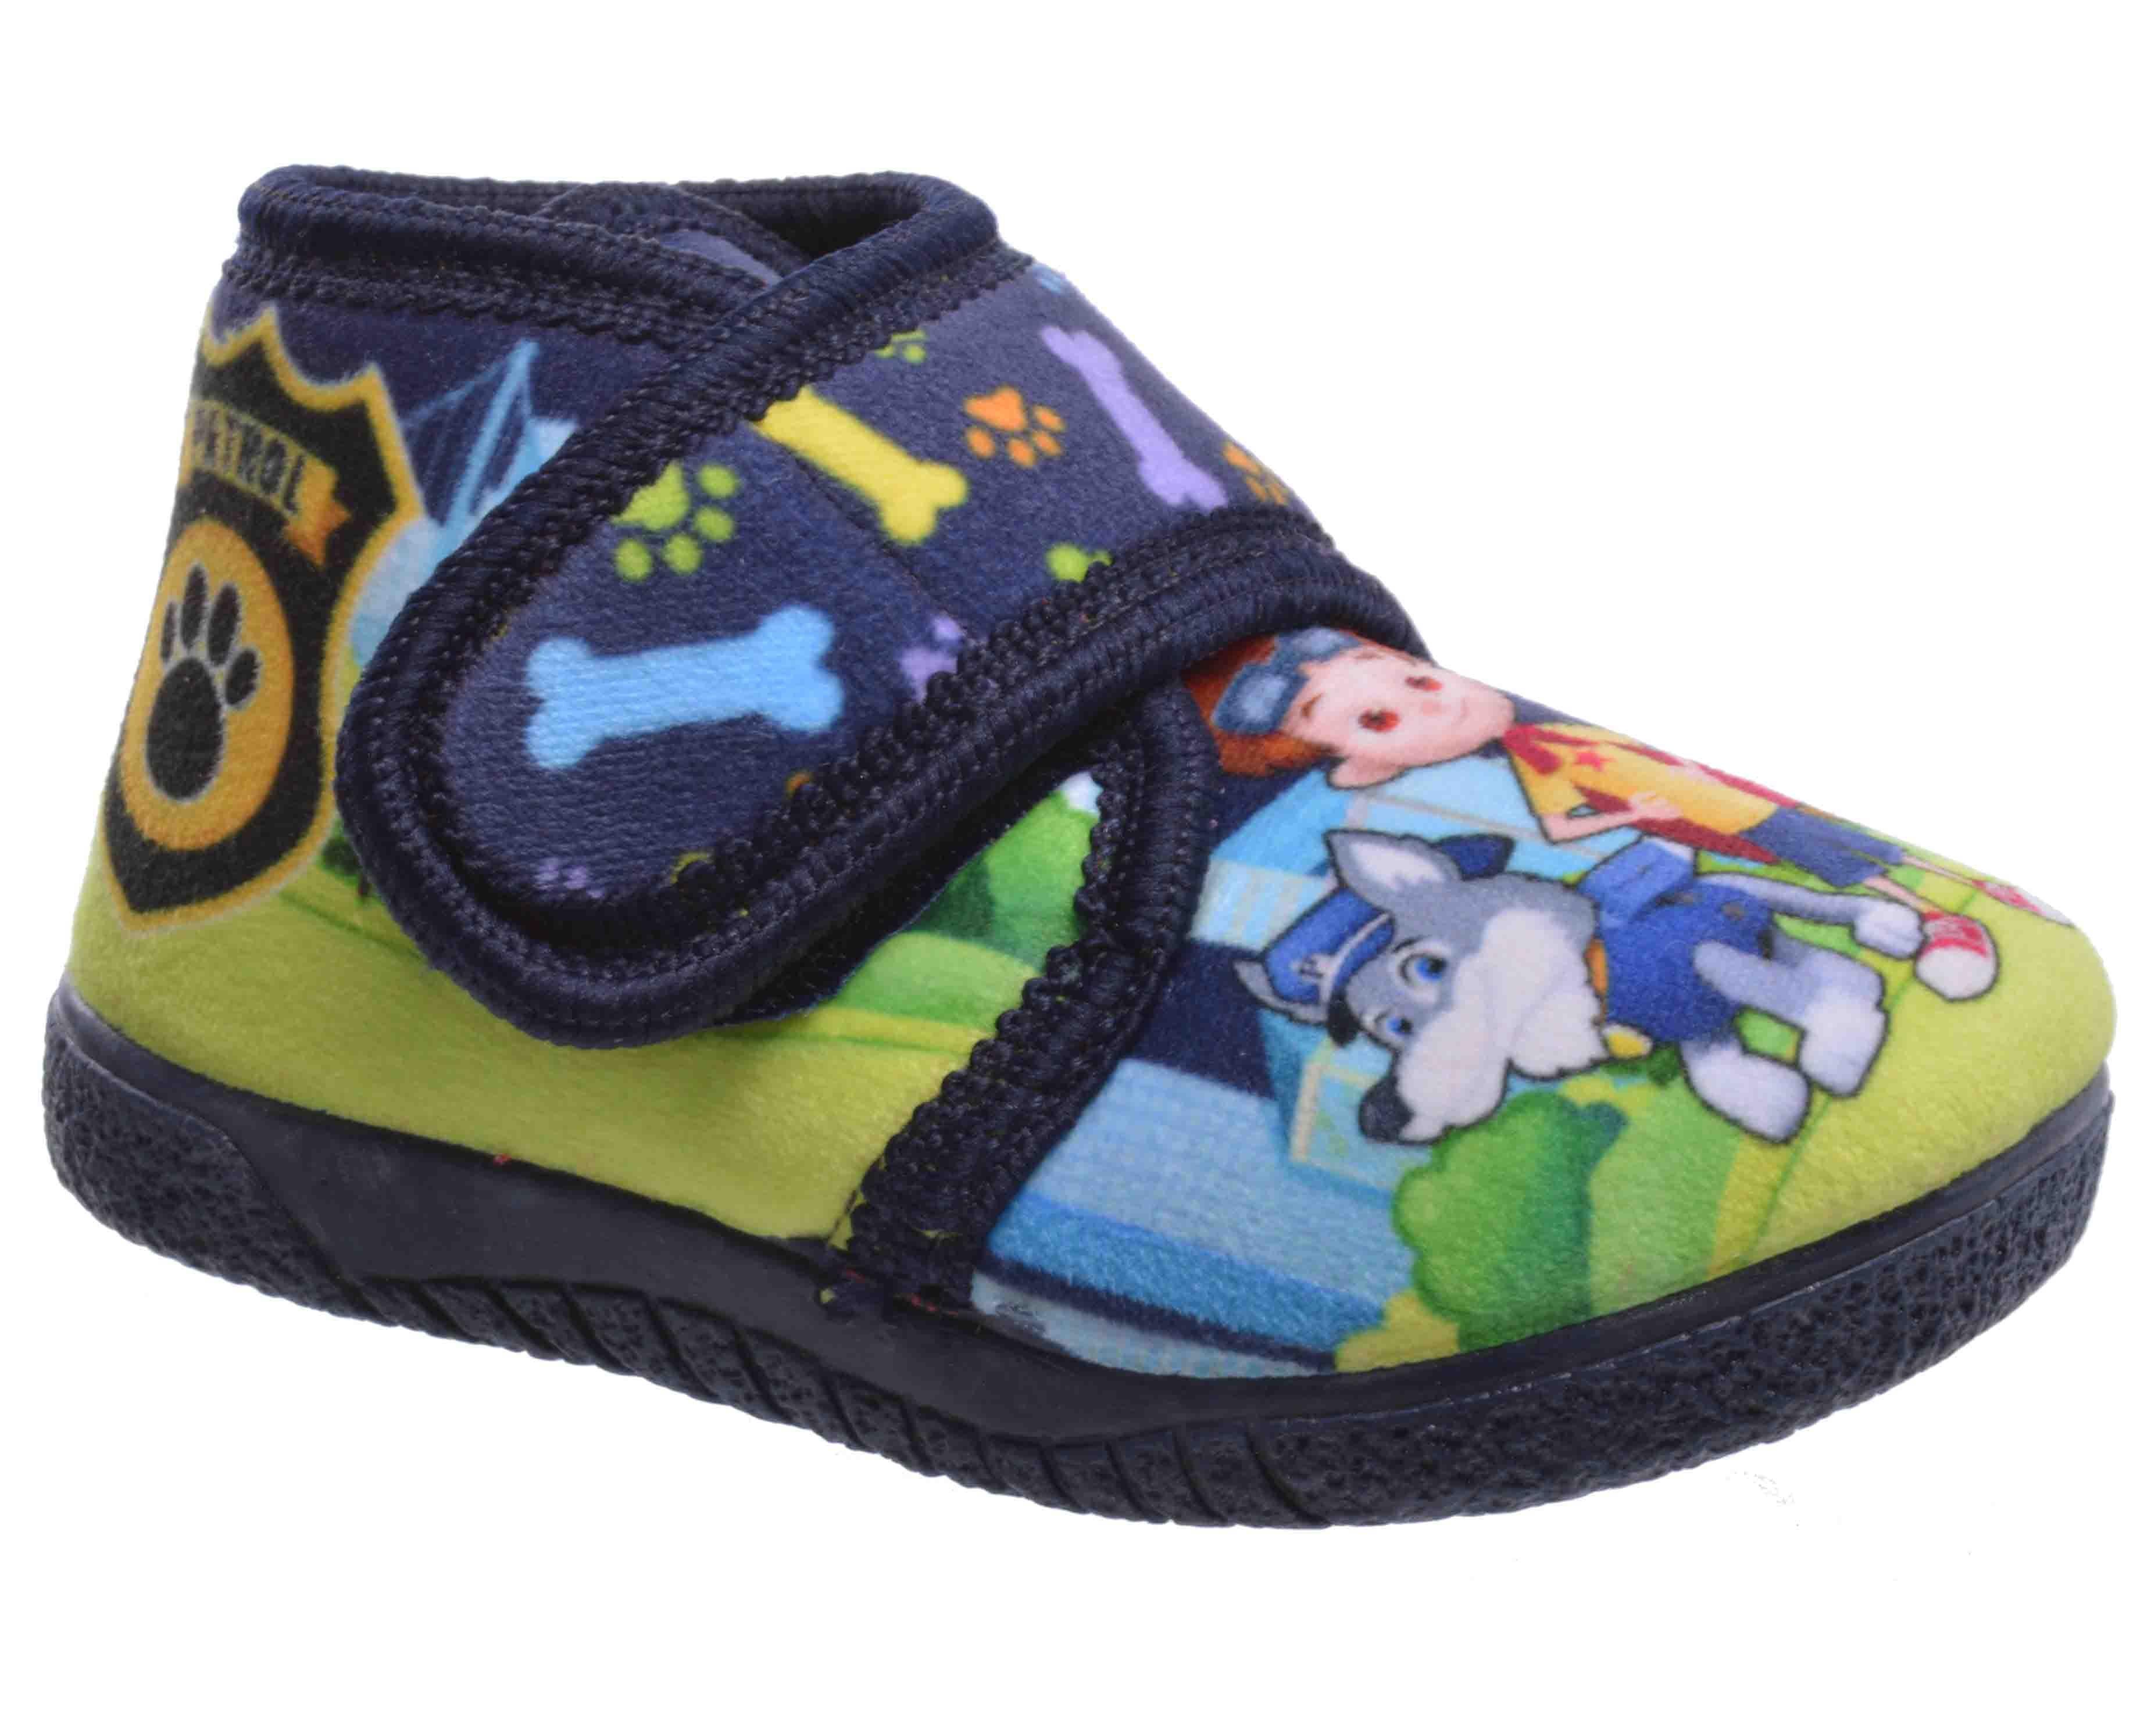 0d085741a0e Antrin 15000 Μπλε Σκούρο | Apostolidis Shoes